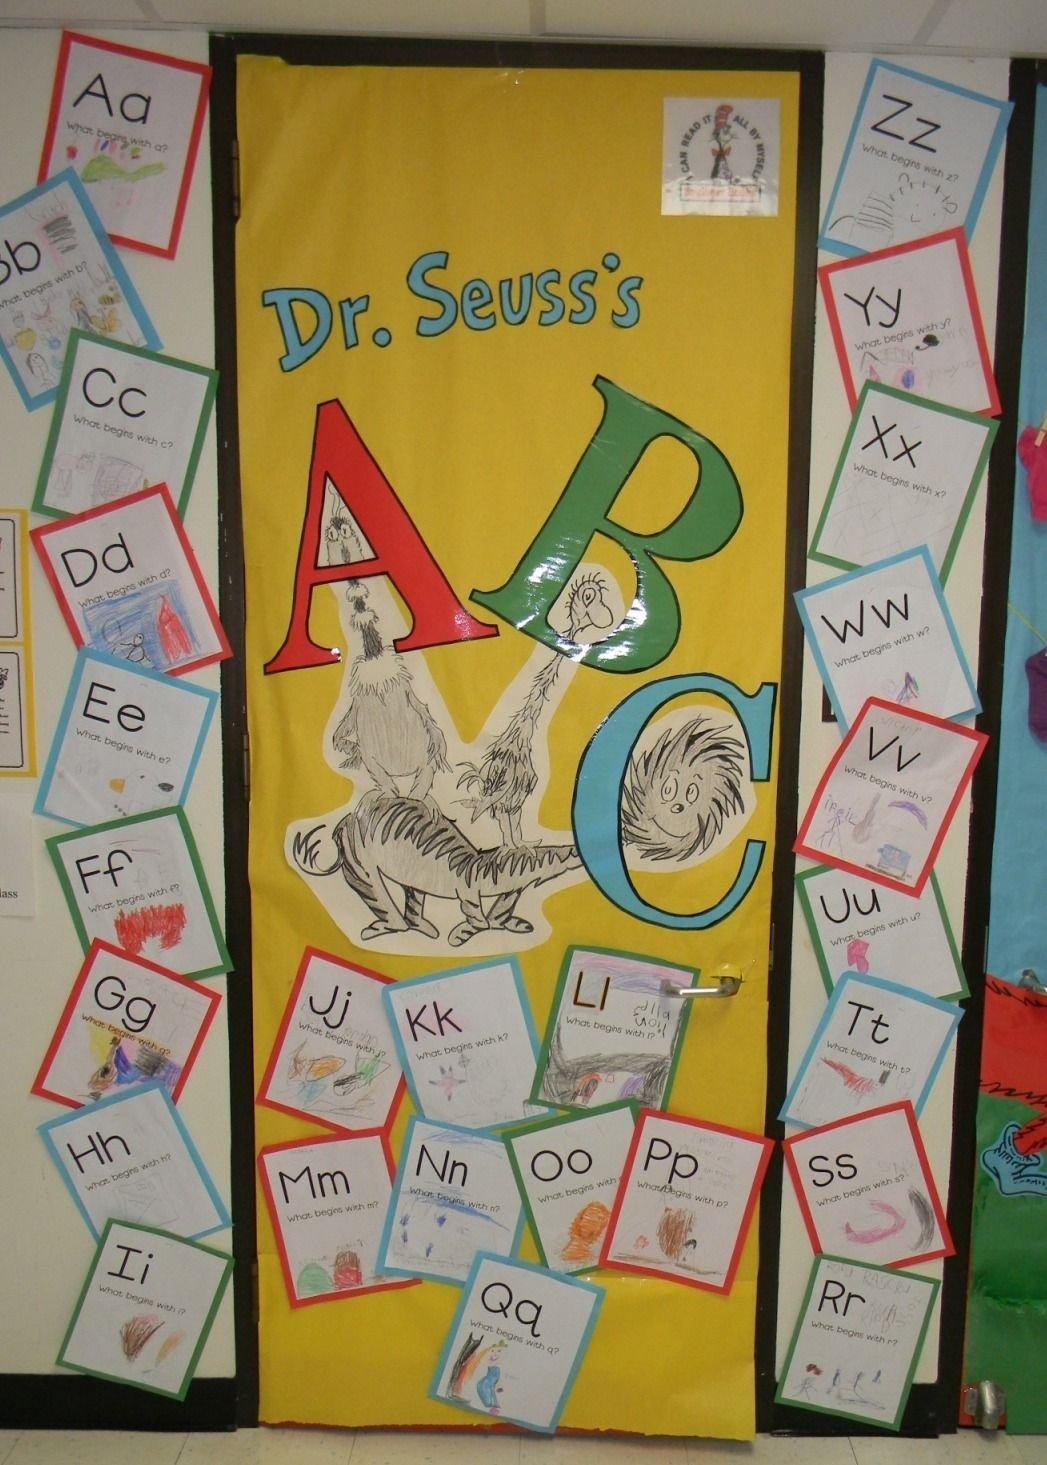 10 Attractive Dr Seuss Classroom Decorating Ideas dr seuss classroom ideas school takes part in read across 1 2020